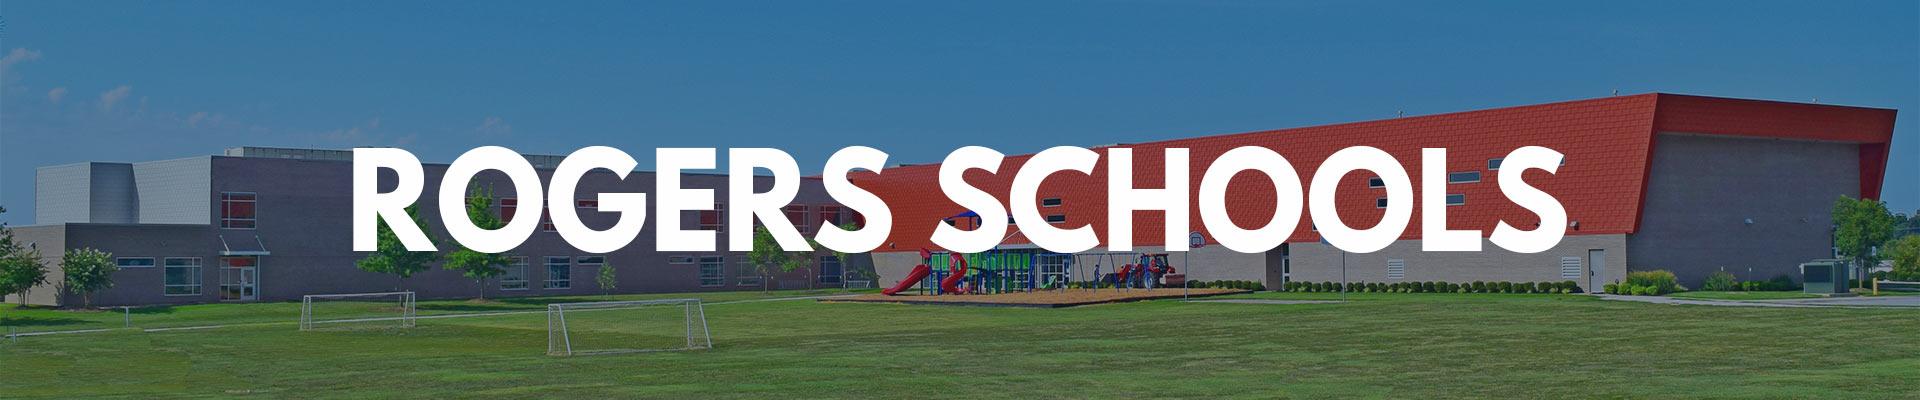 Search Neighborhoods in the Rogers School District ...